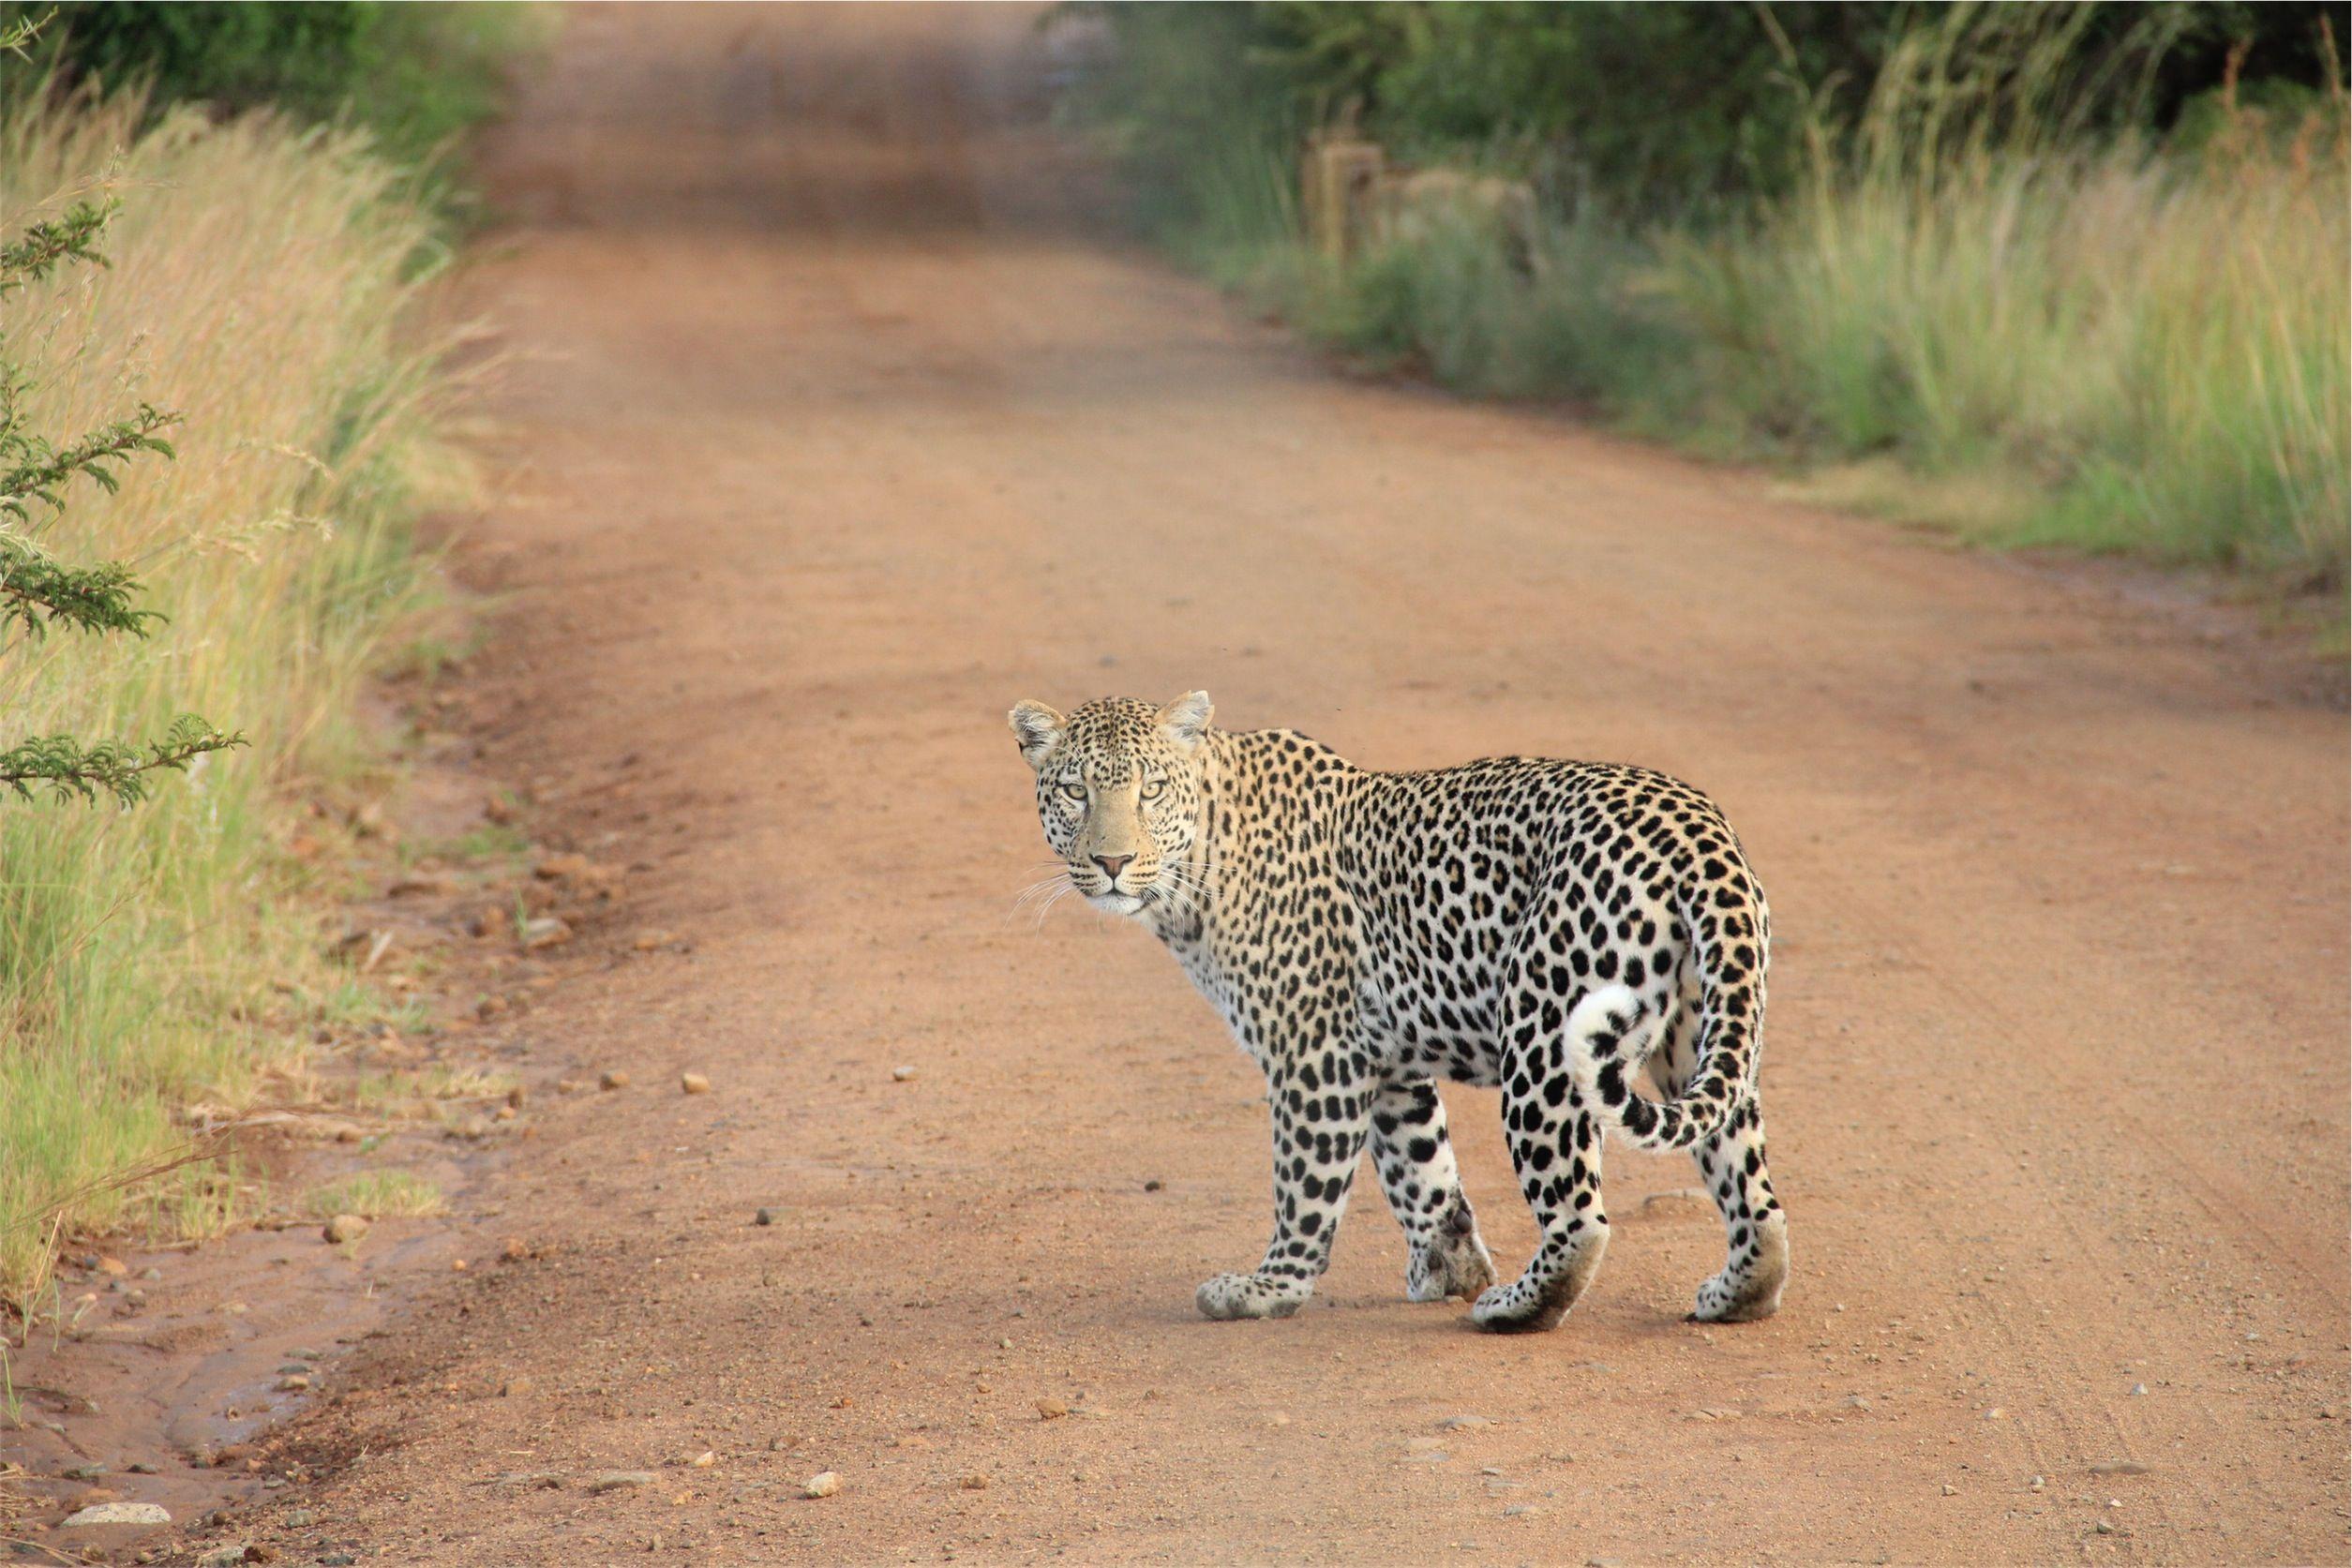 lions-tigers-and-leopards-oh-my.JPG(JPEG 圖片,2509x1673 像素) - 已縮放 (56%)